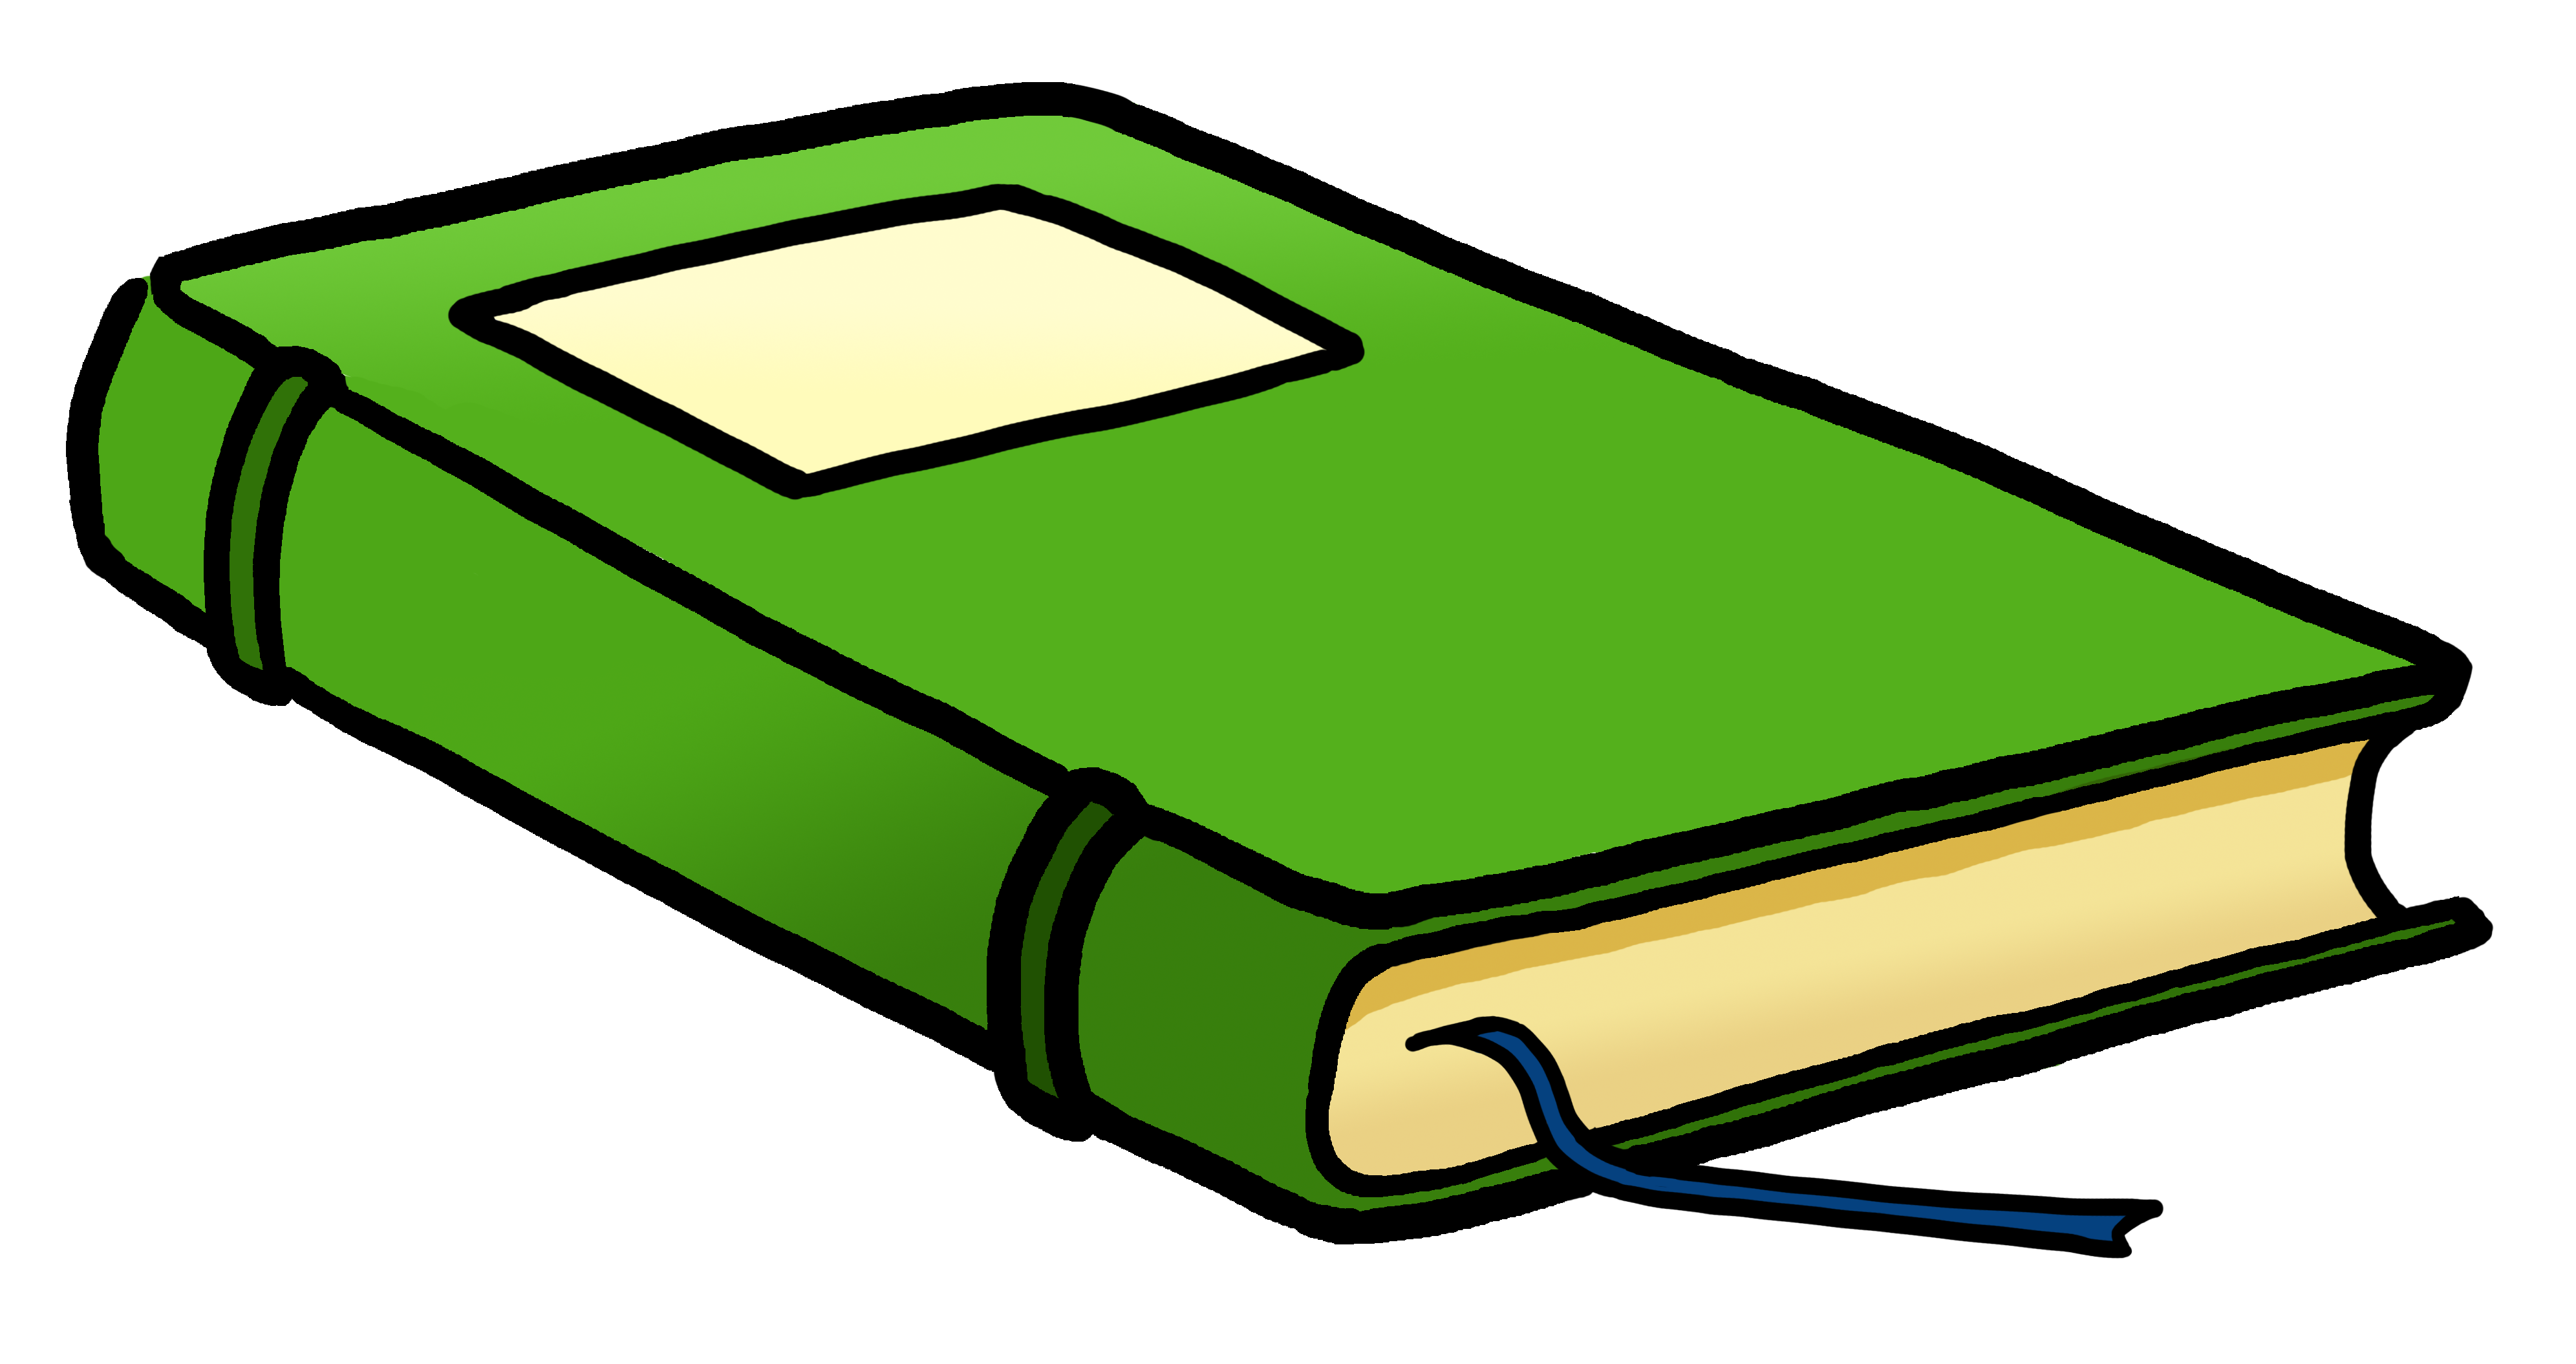 Book Clip Art | Clipart Panda - Free Clipart Images